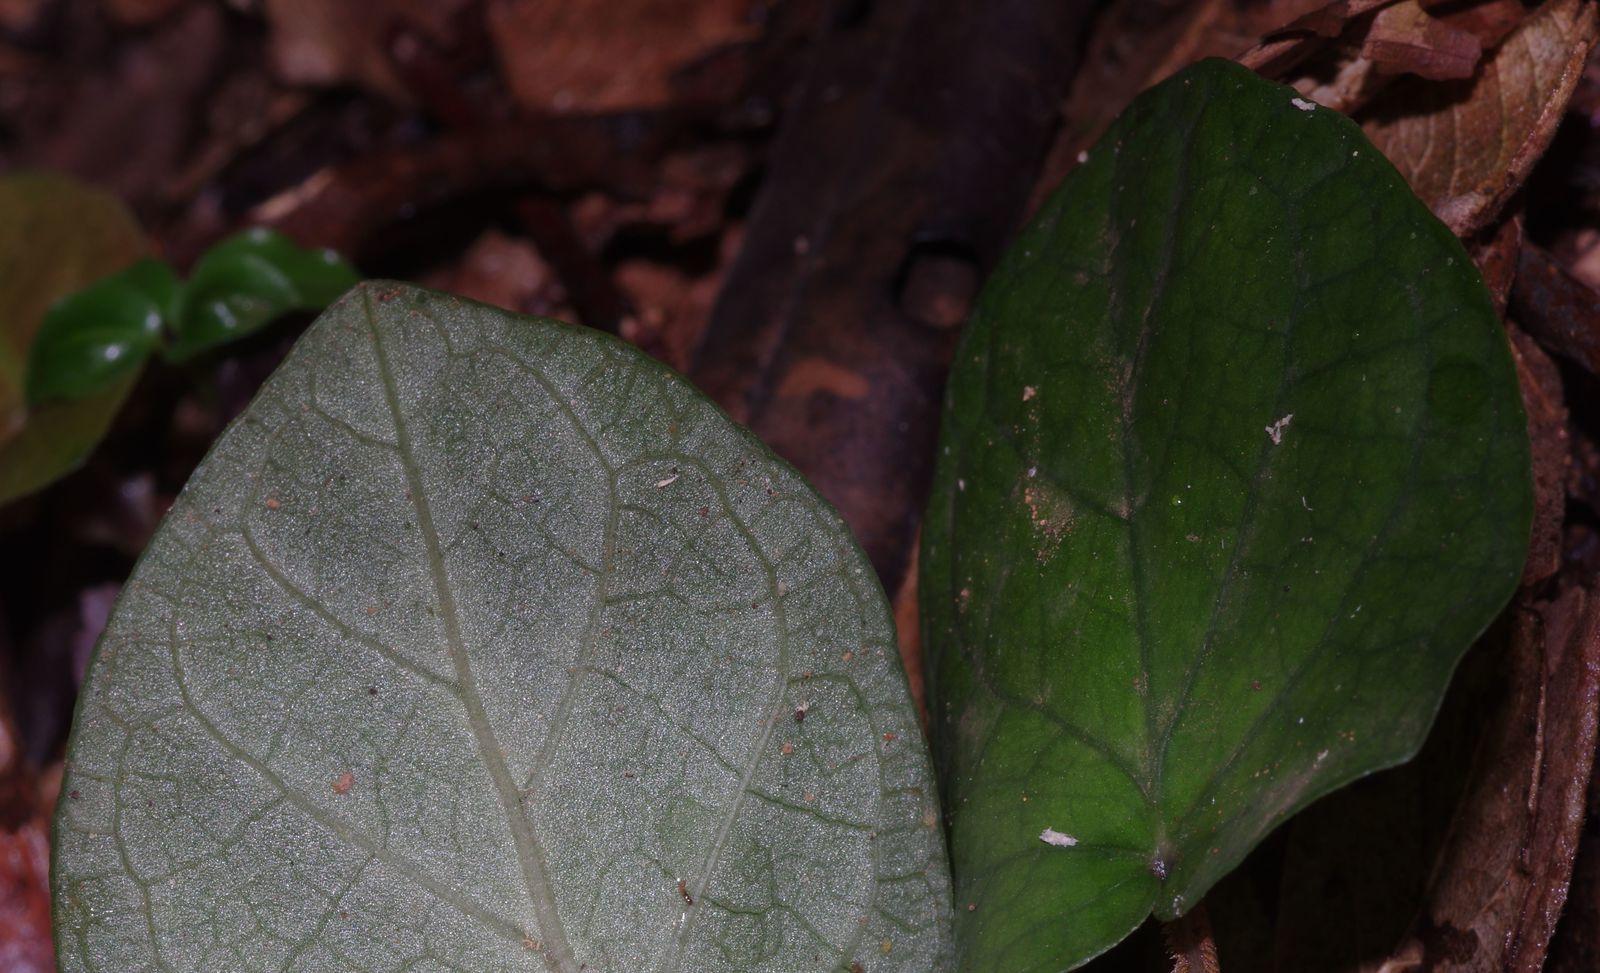 Geophila repens